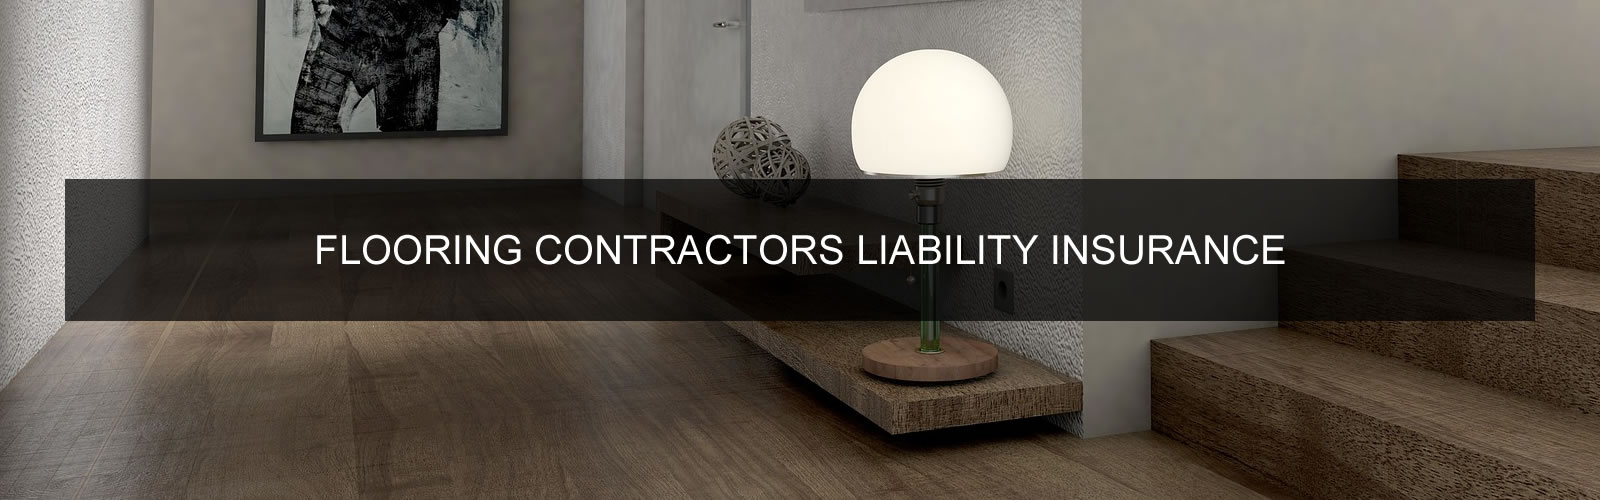 Flooring CONTRACTORS LIABILITY INSURANCE